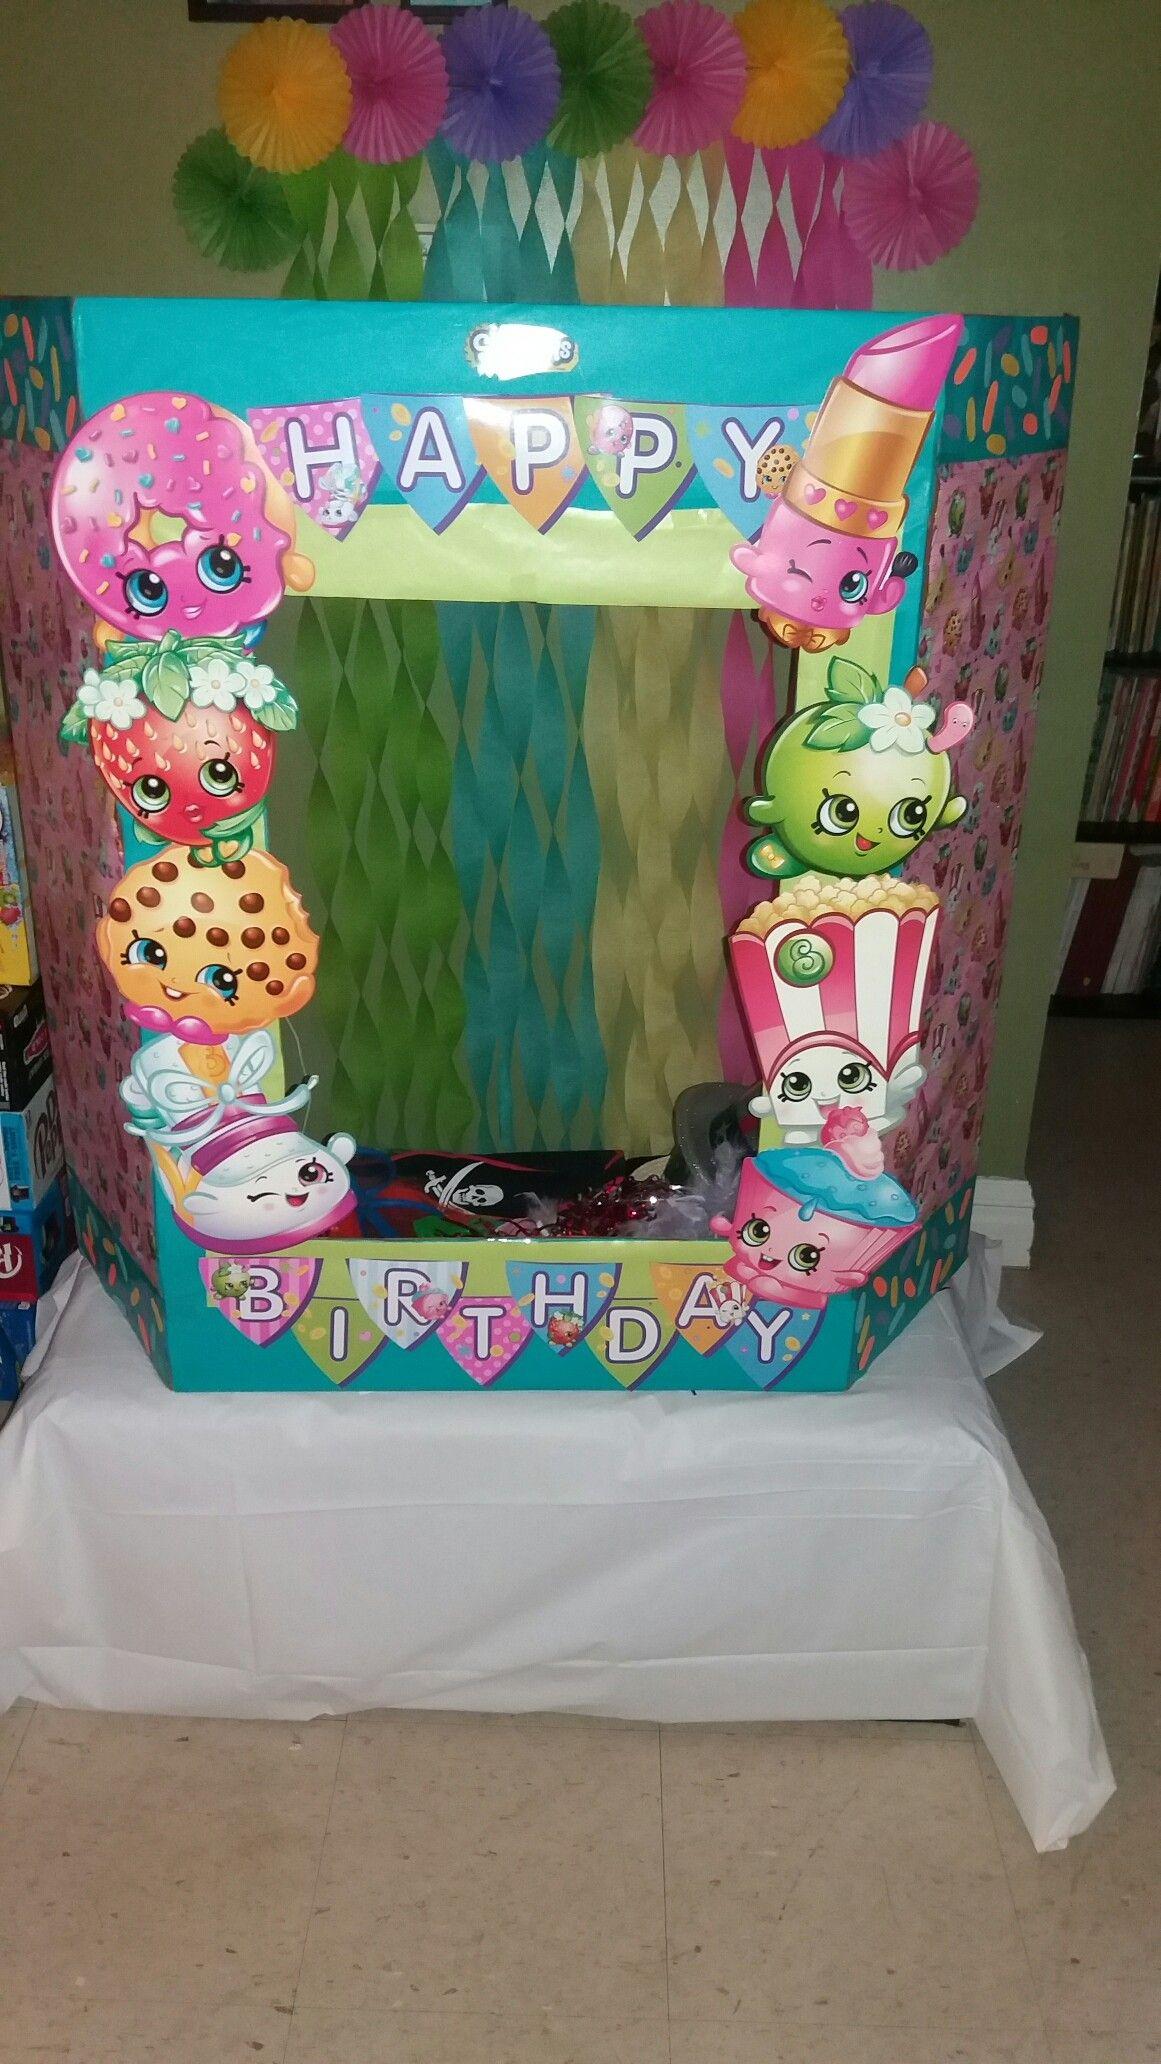 Diy Shopkins Photo Booth Shopkins Birthday Party Decoration Shopkins Birthday Party Shopkins Party Decorations